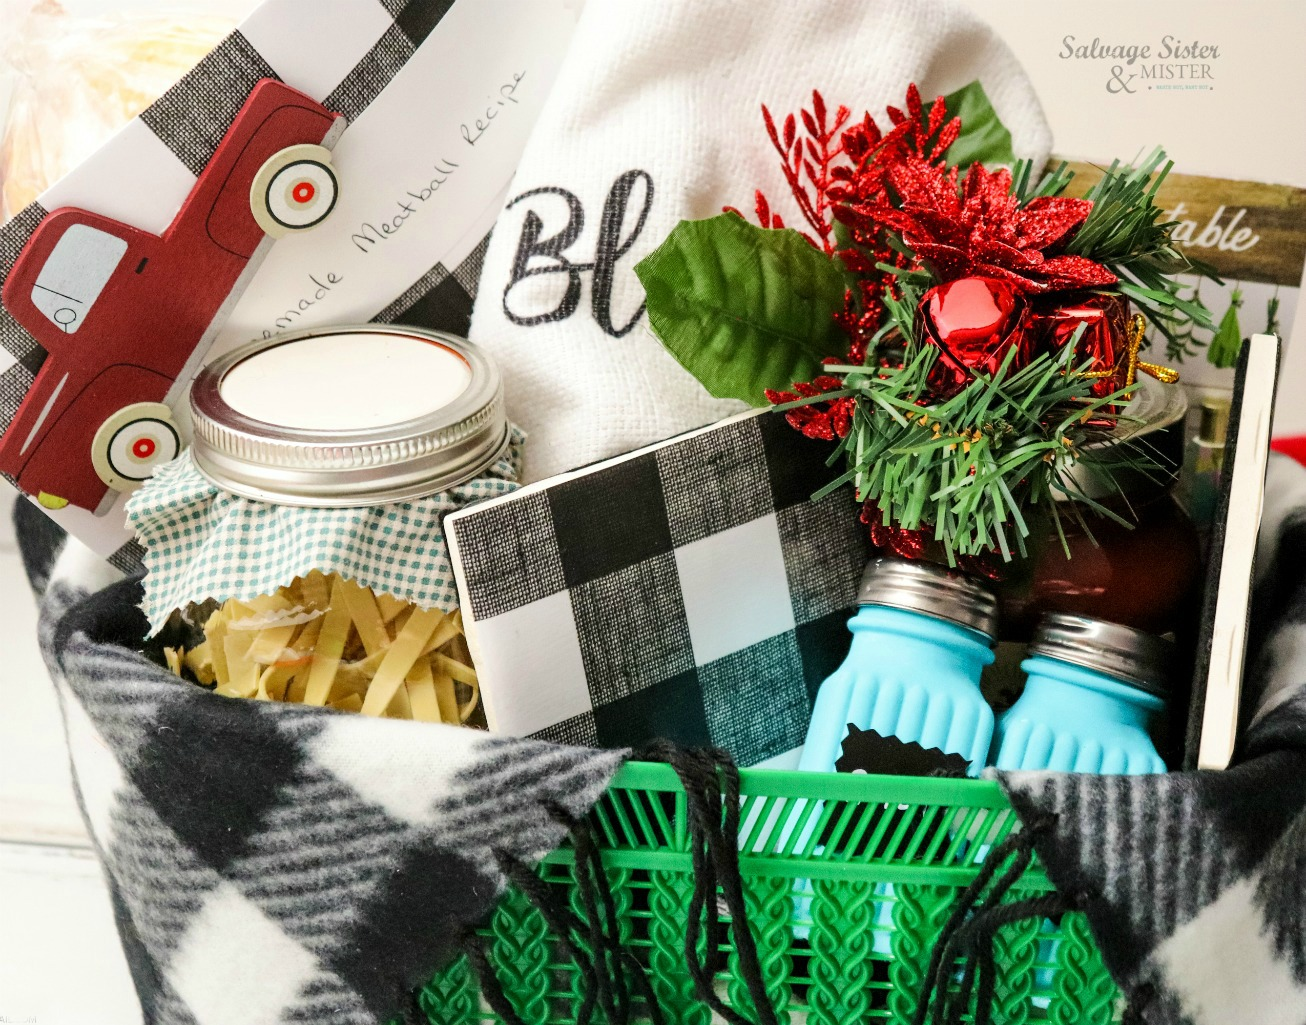 Italian Dinner Gift Basket - holiday git on salvagesisternadmister.com